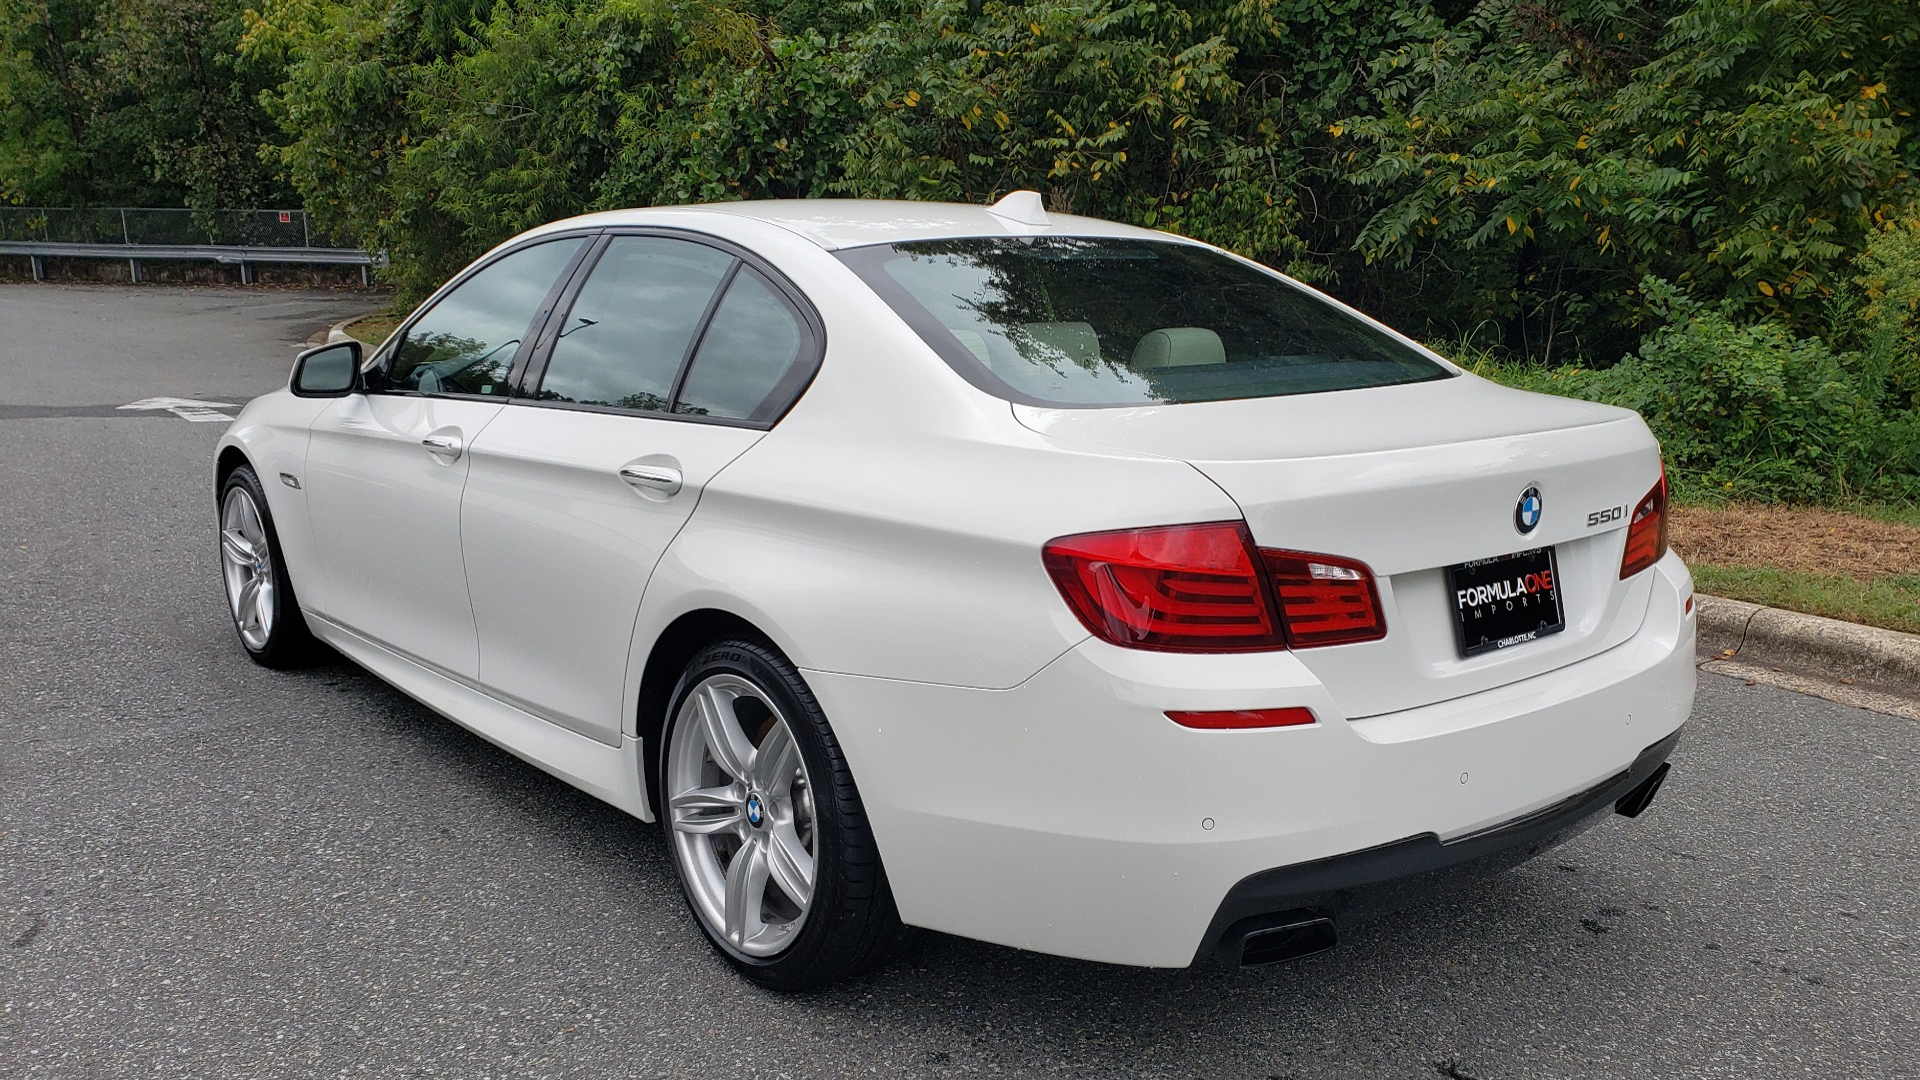 Used 2012 BMW 5 SERIES 550I M SPORT / NAV / CONV PKG / SUNROOF / PREM SND / REARVIEW for sale Sold at Formula Imports in Charlotte NC 28227 3